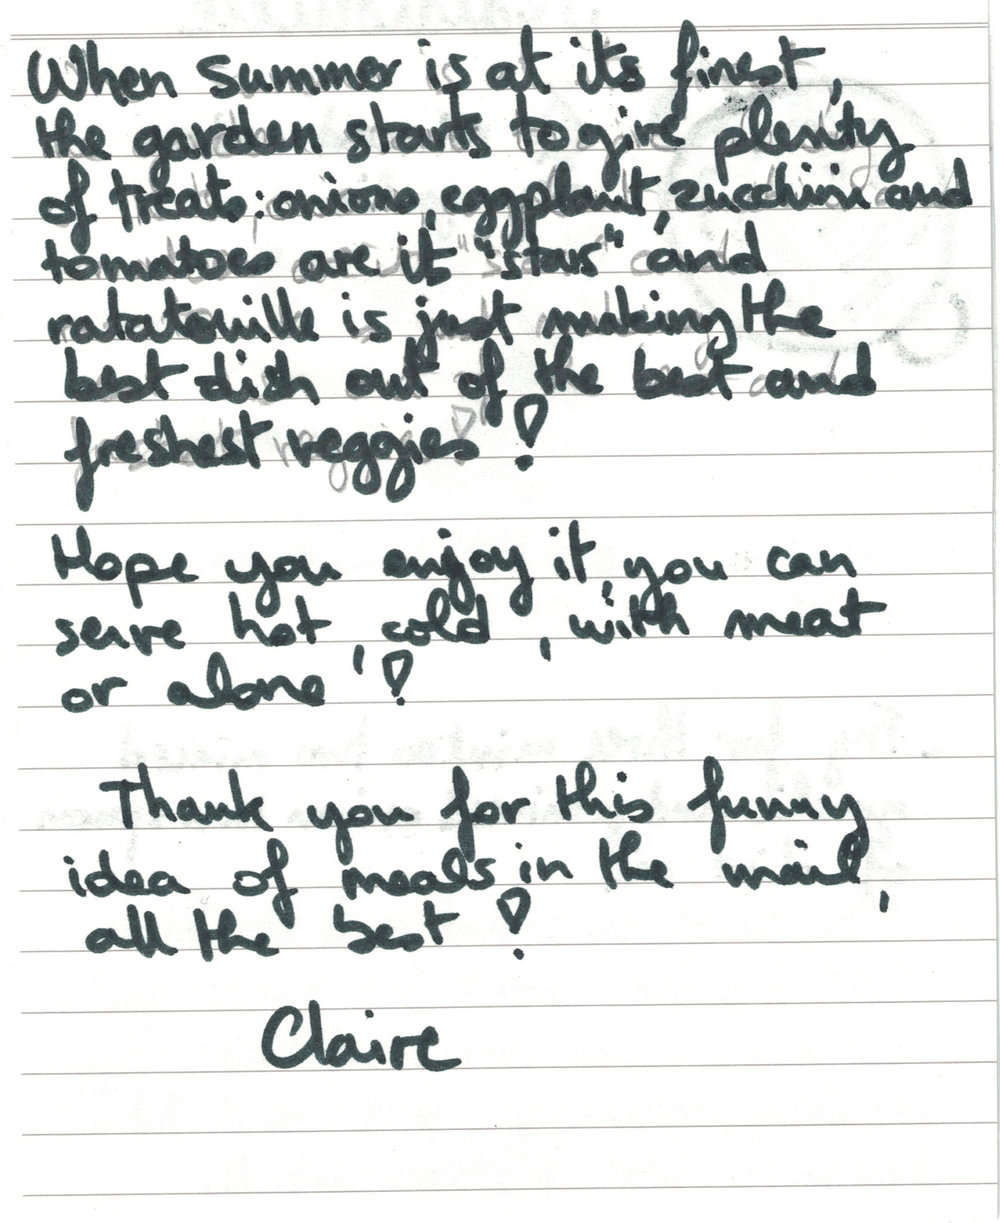 MITM-Claire-letter.jpg